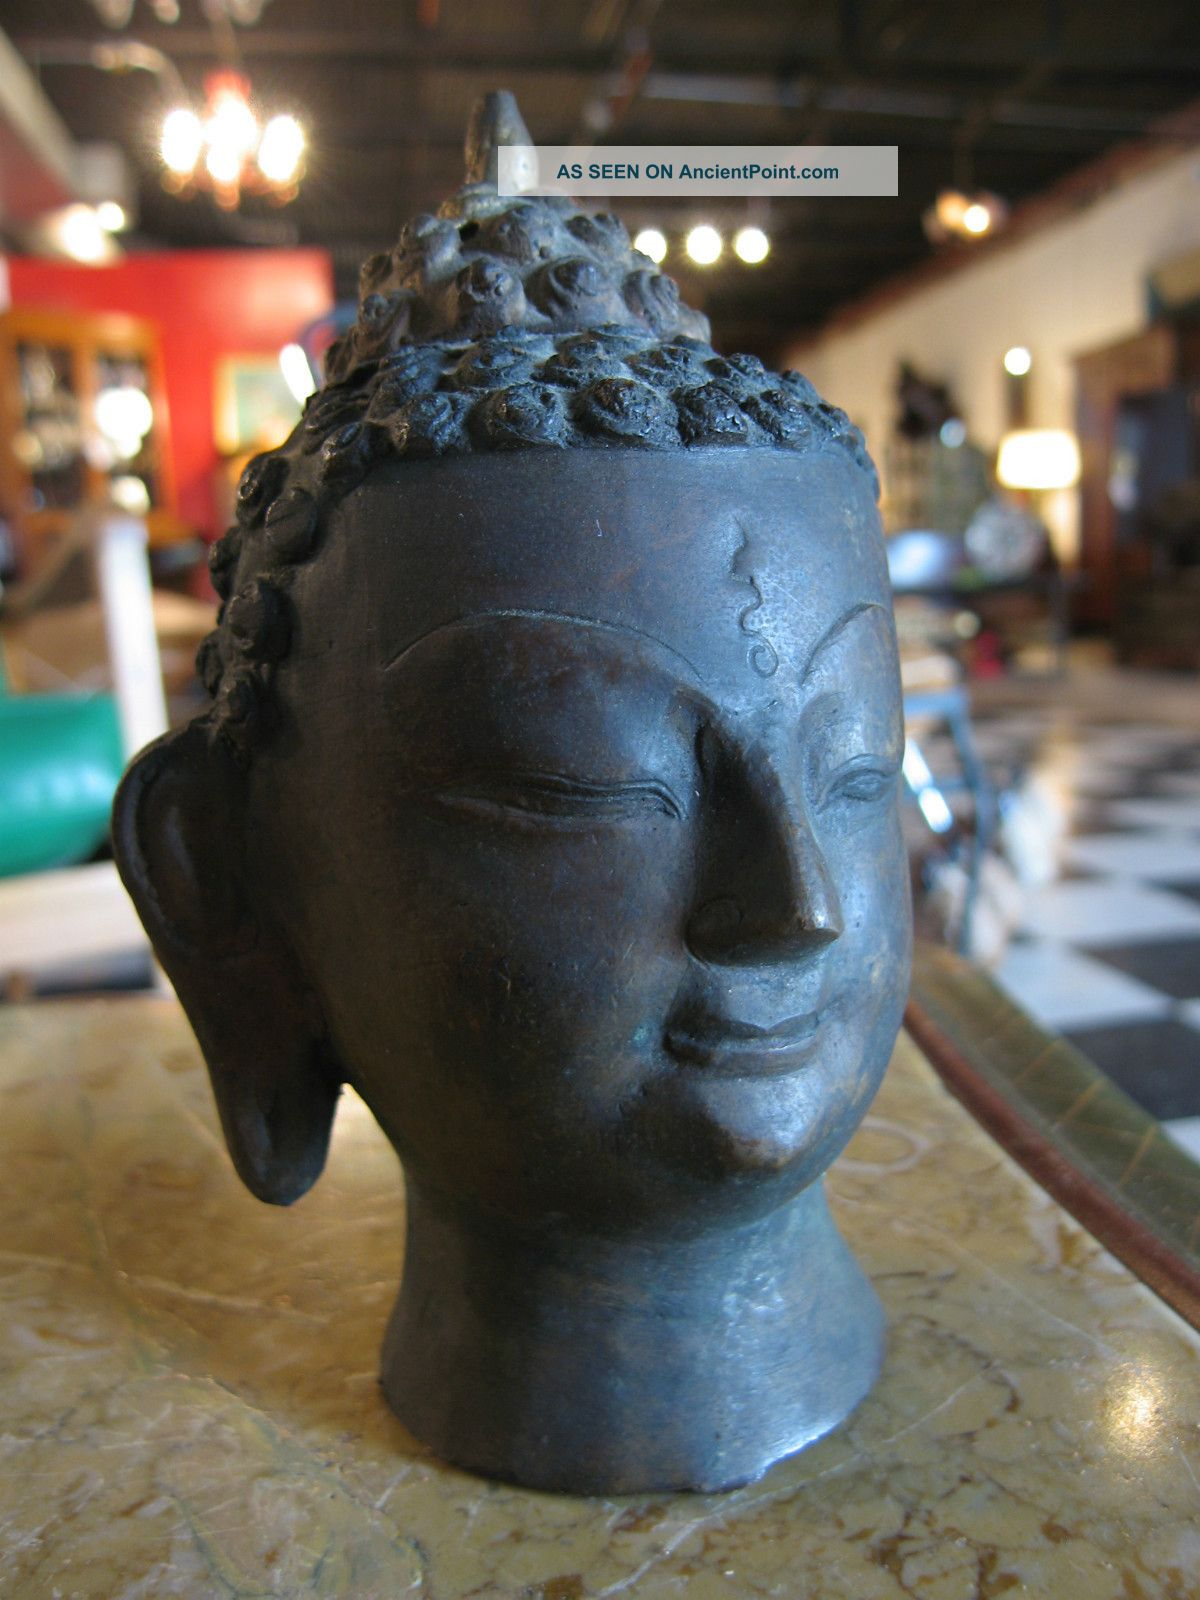 Antique Asian Likely Chinese Metal Bust Of Tai Buddha Buddha photo